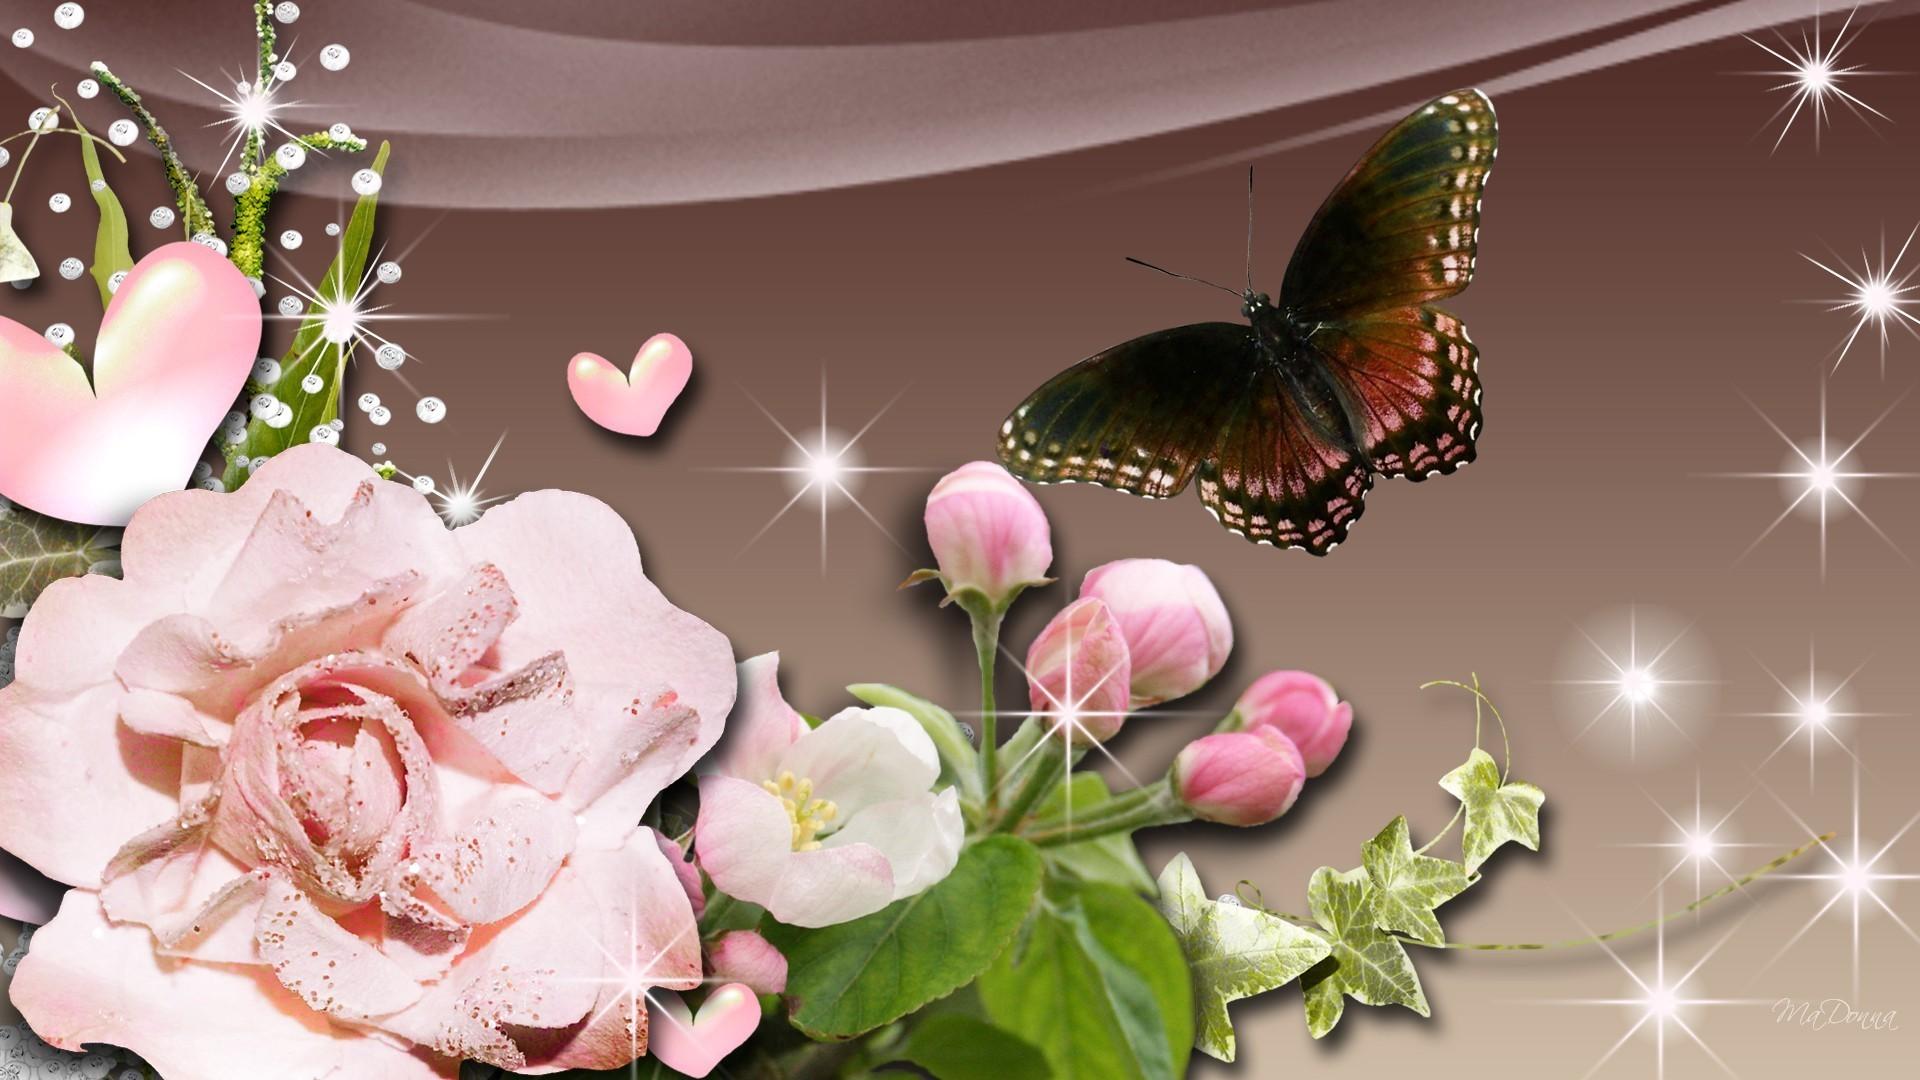 Ivy Persona Glow Diamonds Summer Butterfly Pink Hearts - Garden Roses - HD Wallpaper